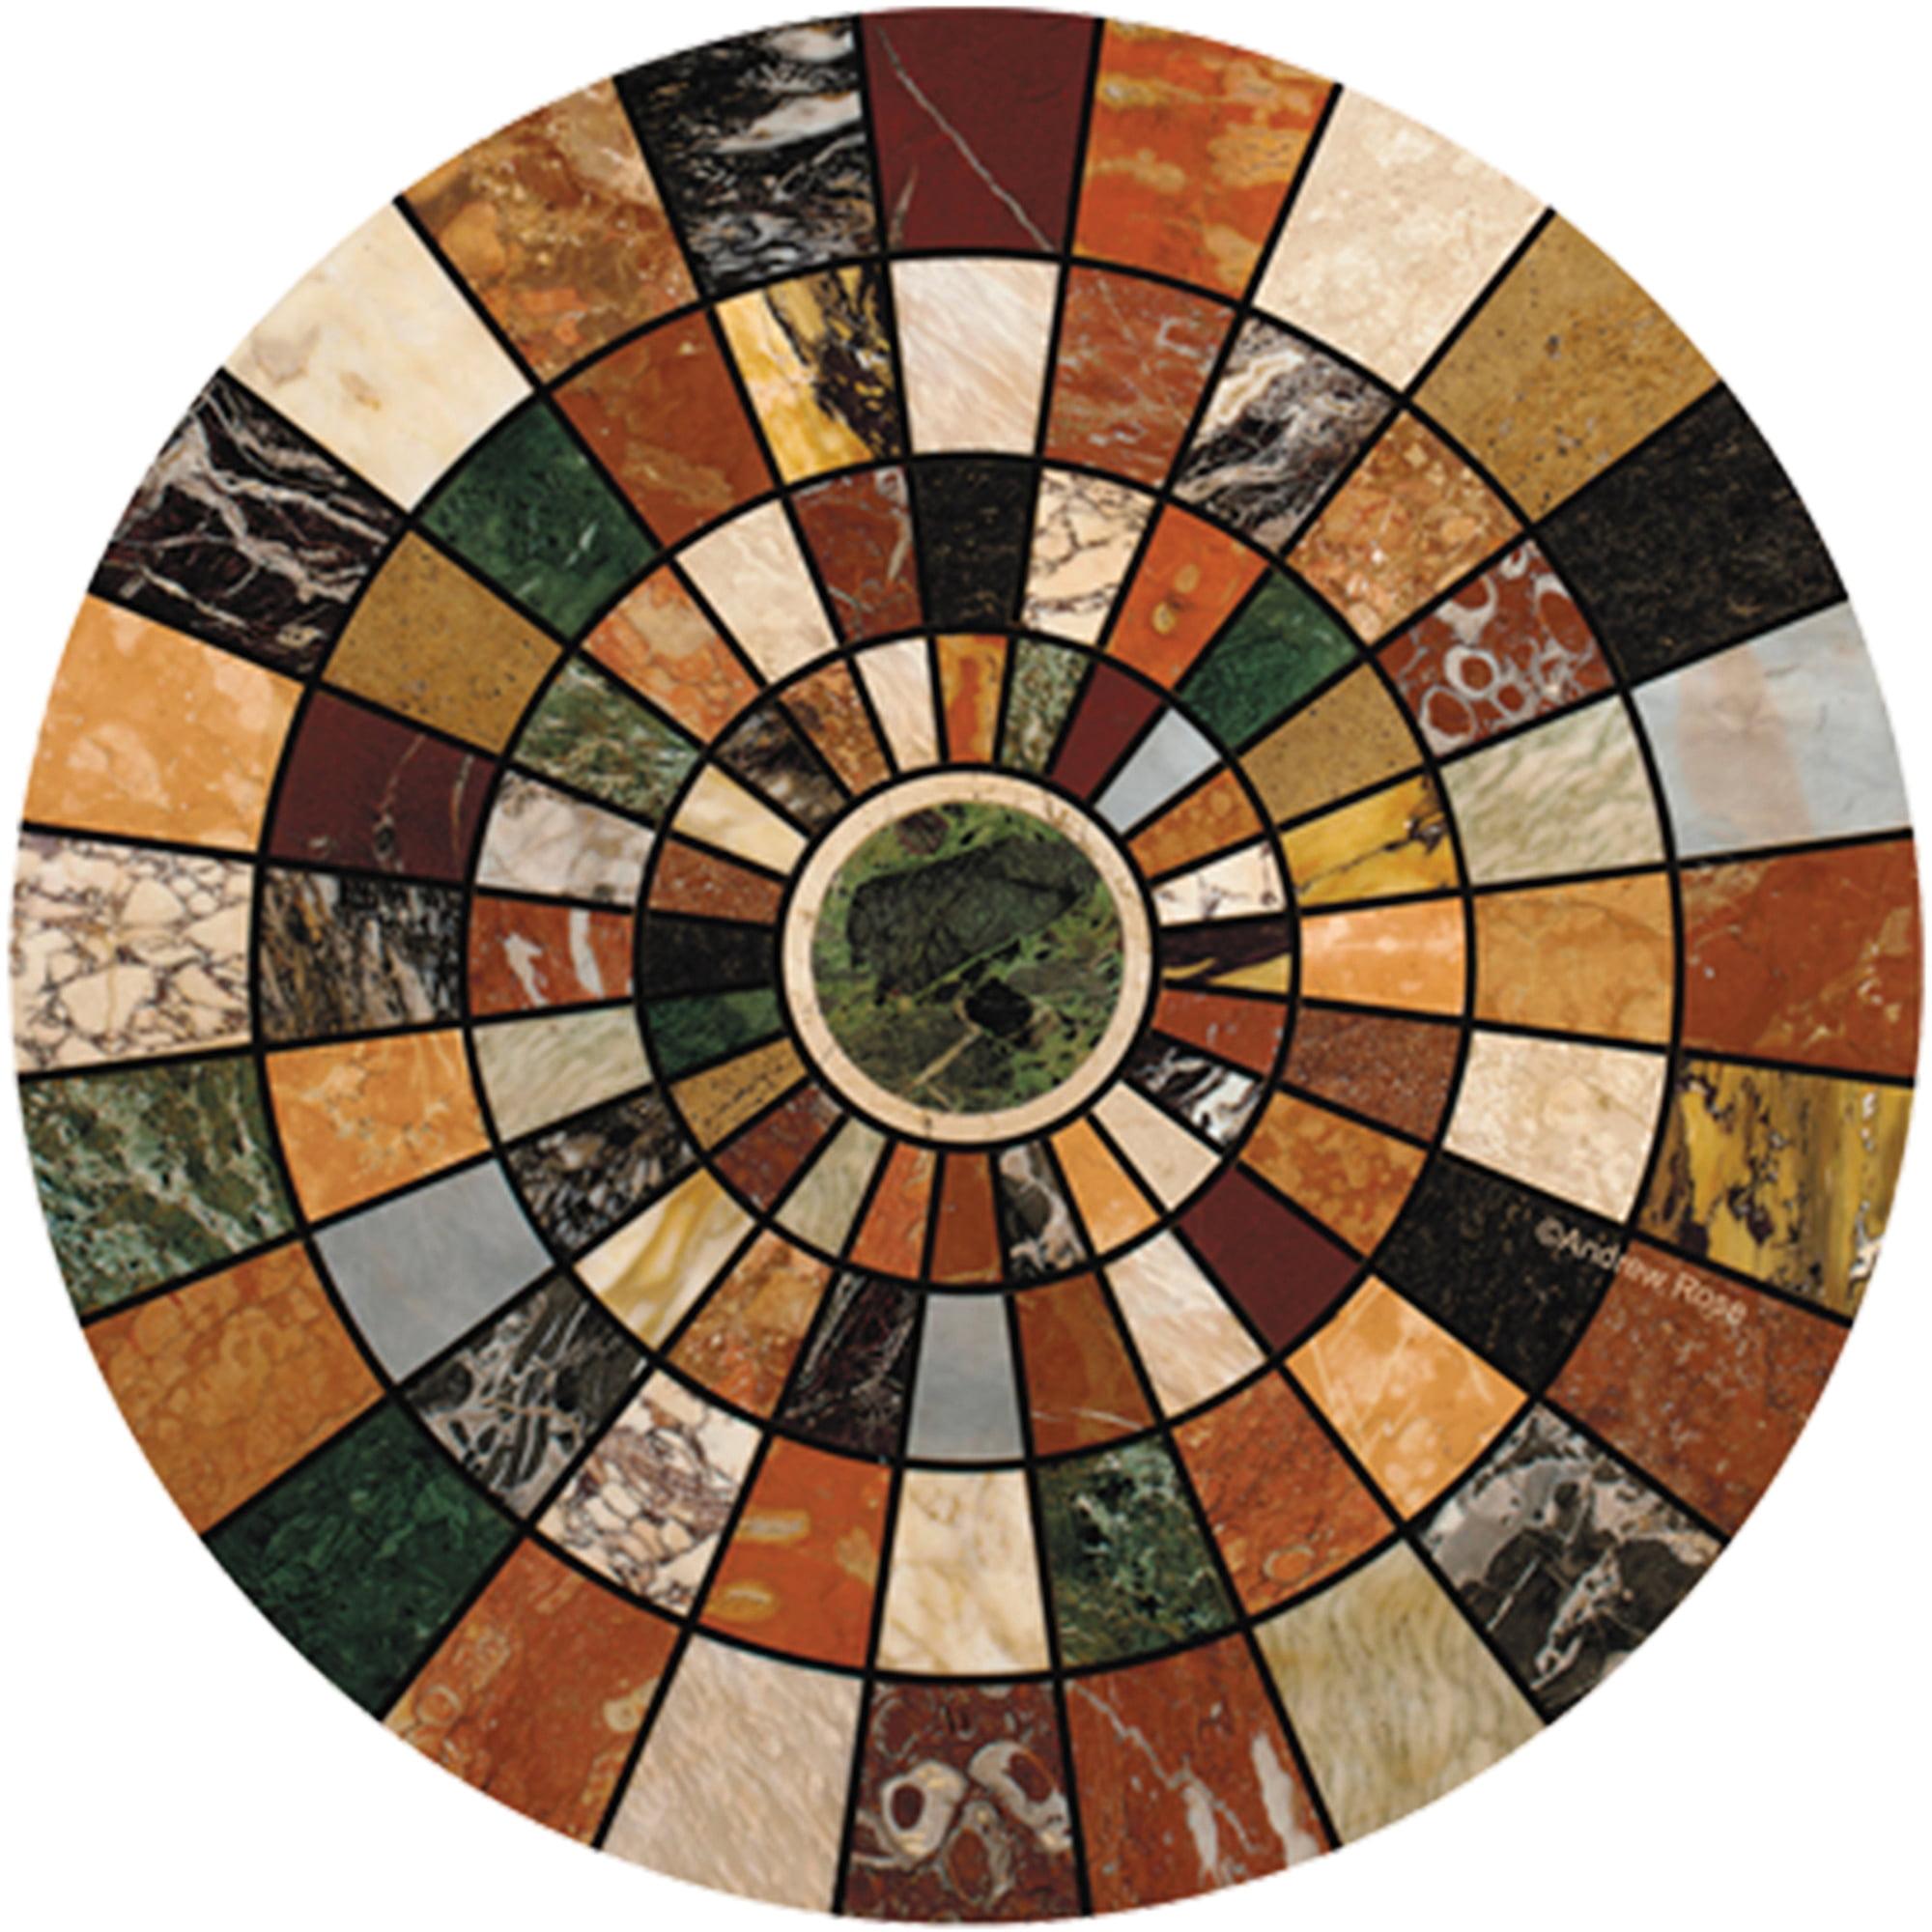 Thirstystone Drink Coasters Set, Marble Mosaic